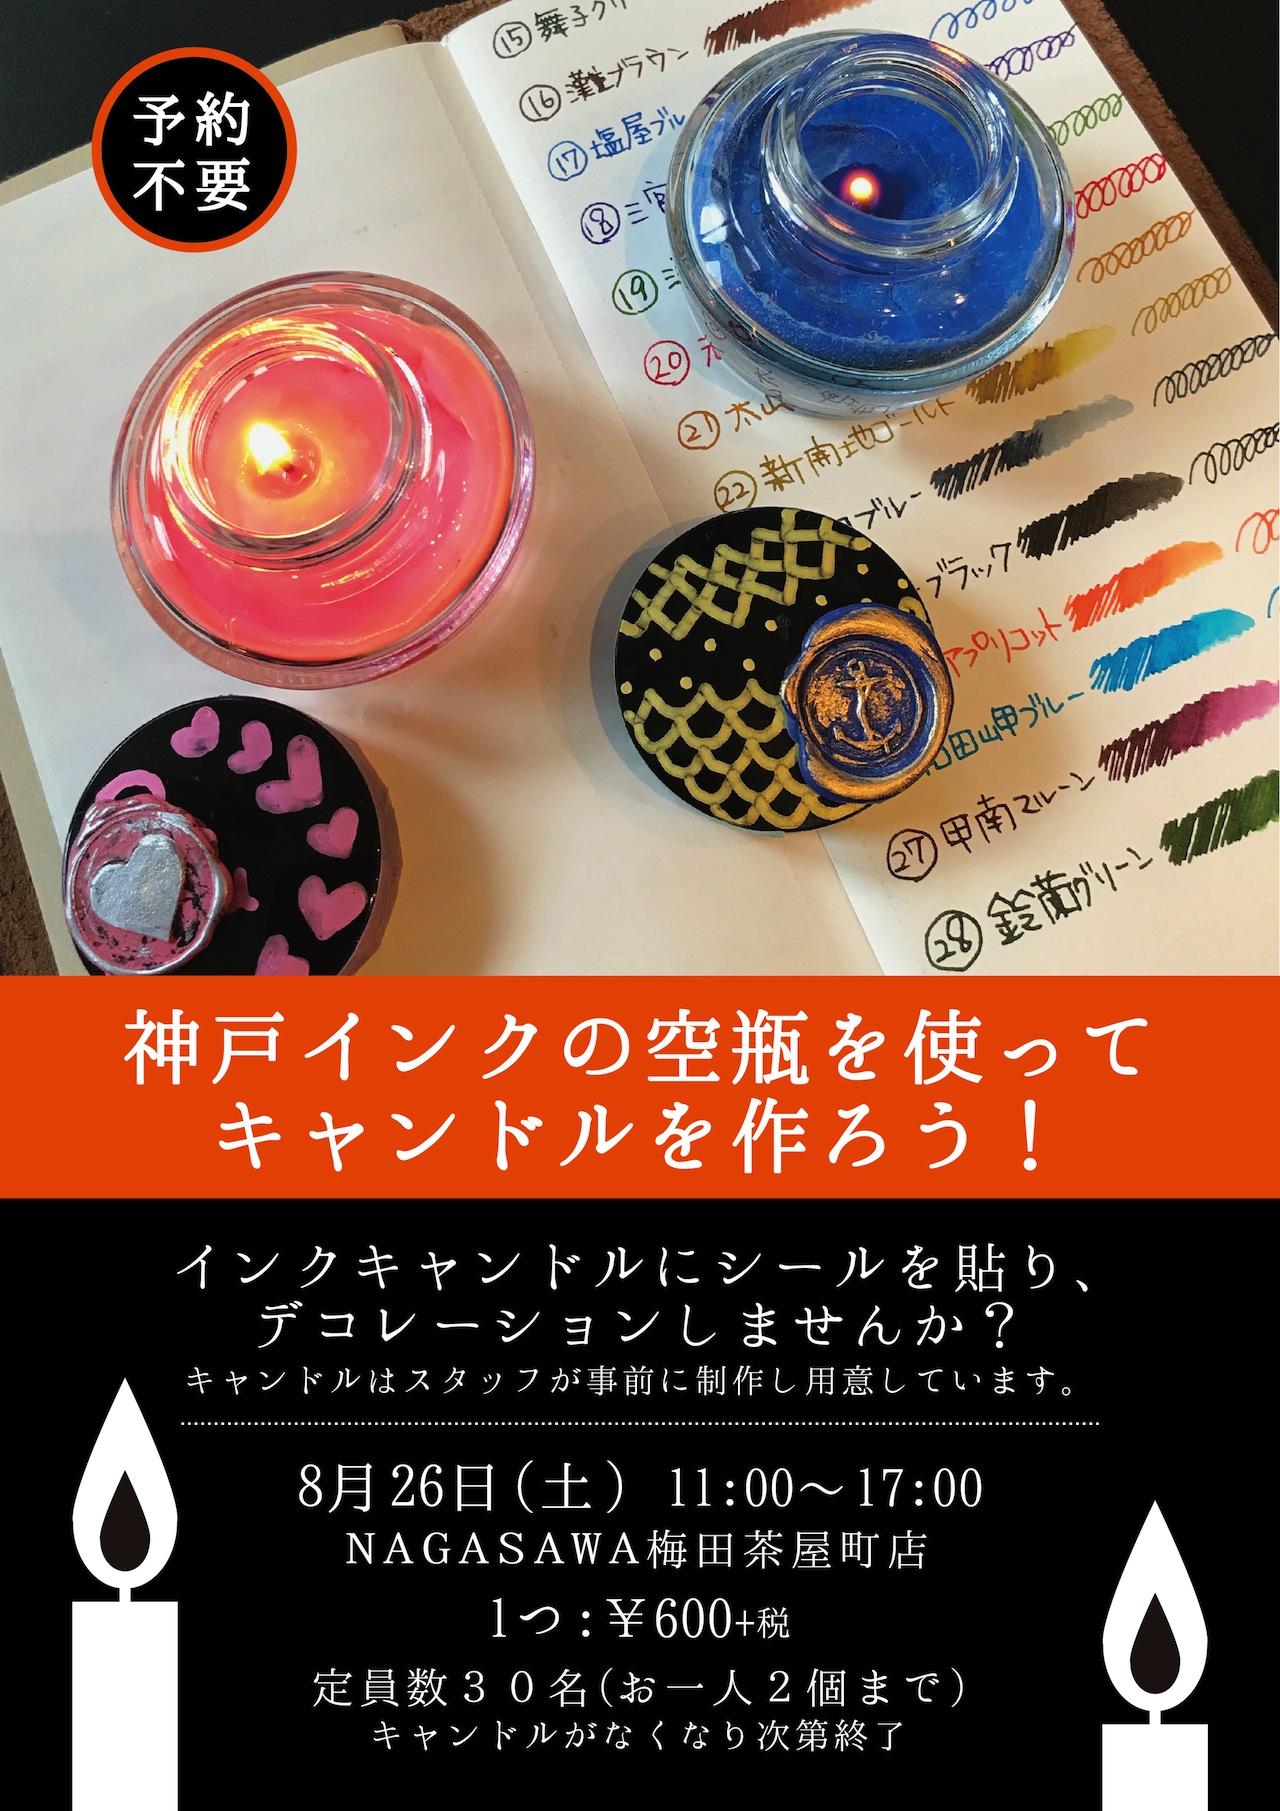 KobeINK物語の空瓶を使ってキャンドルをつくろう! @ NAGASAWA梅田茶屋町店